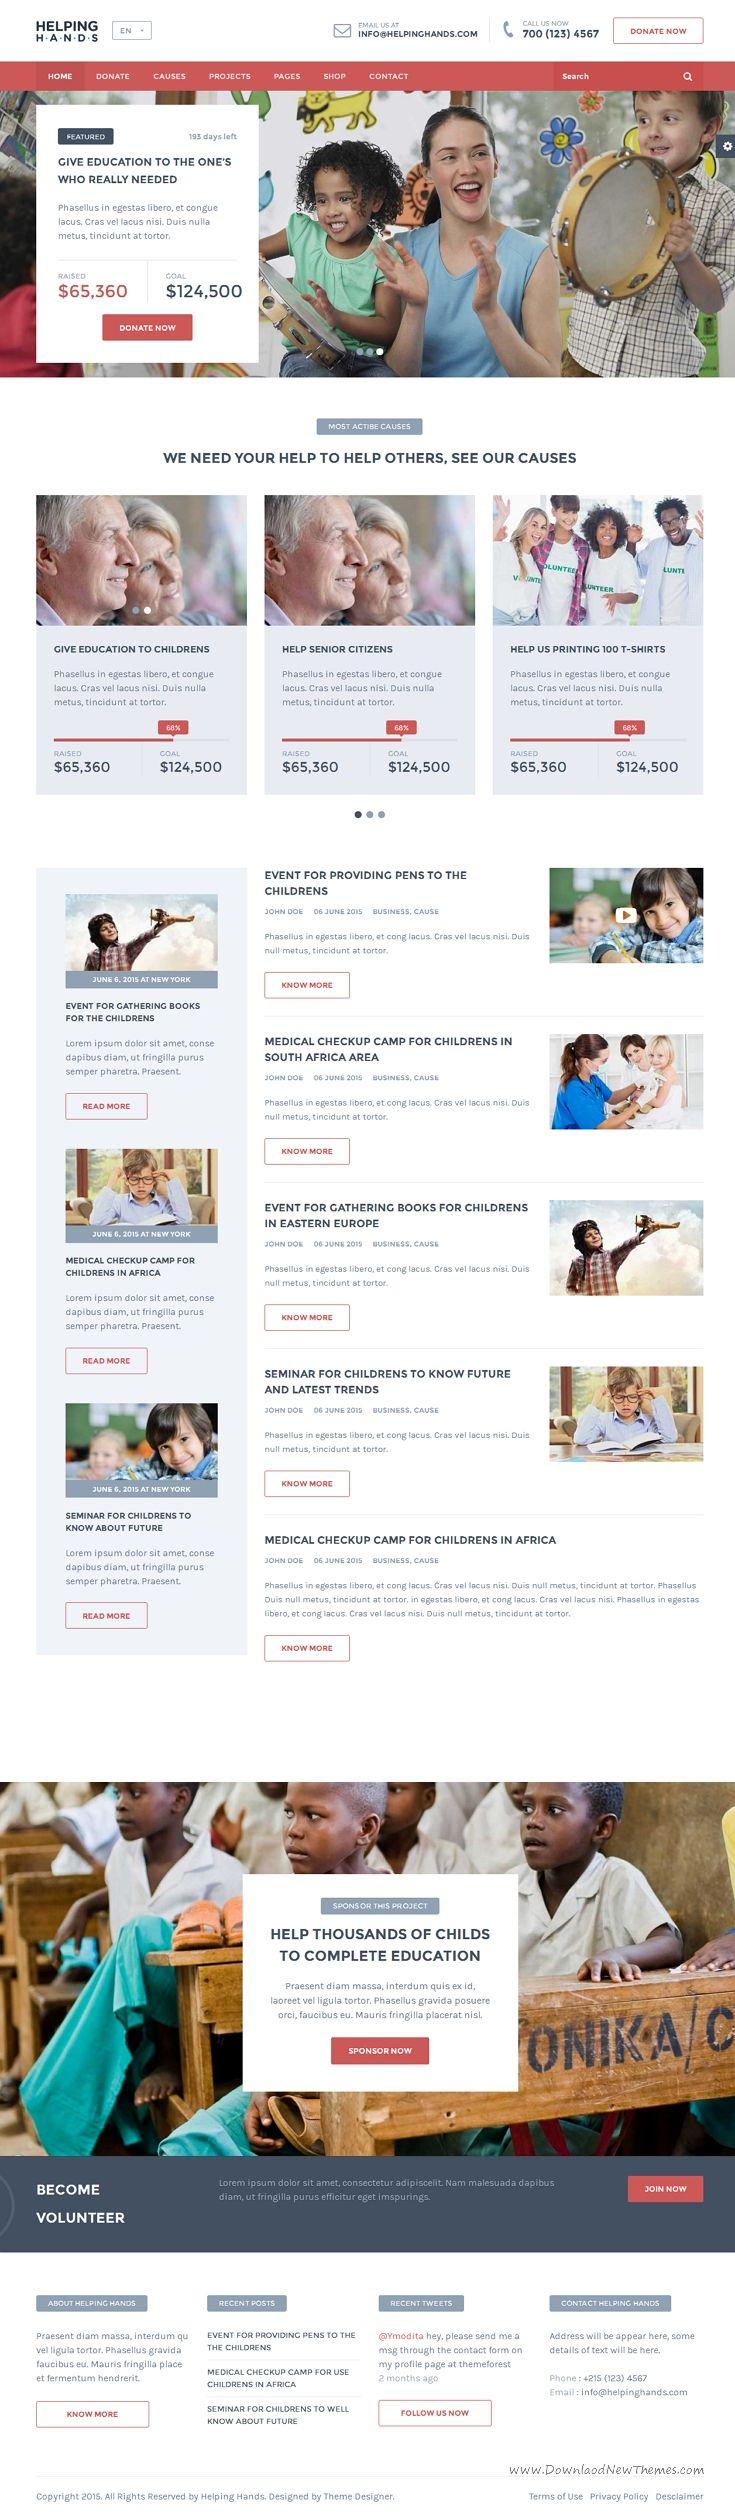 7 best NGO FIBF images on Pinterest | Website designs, Charity ...